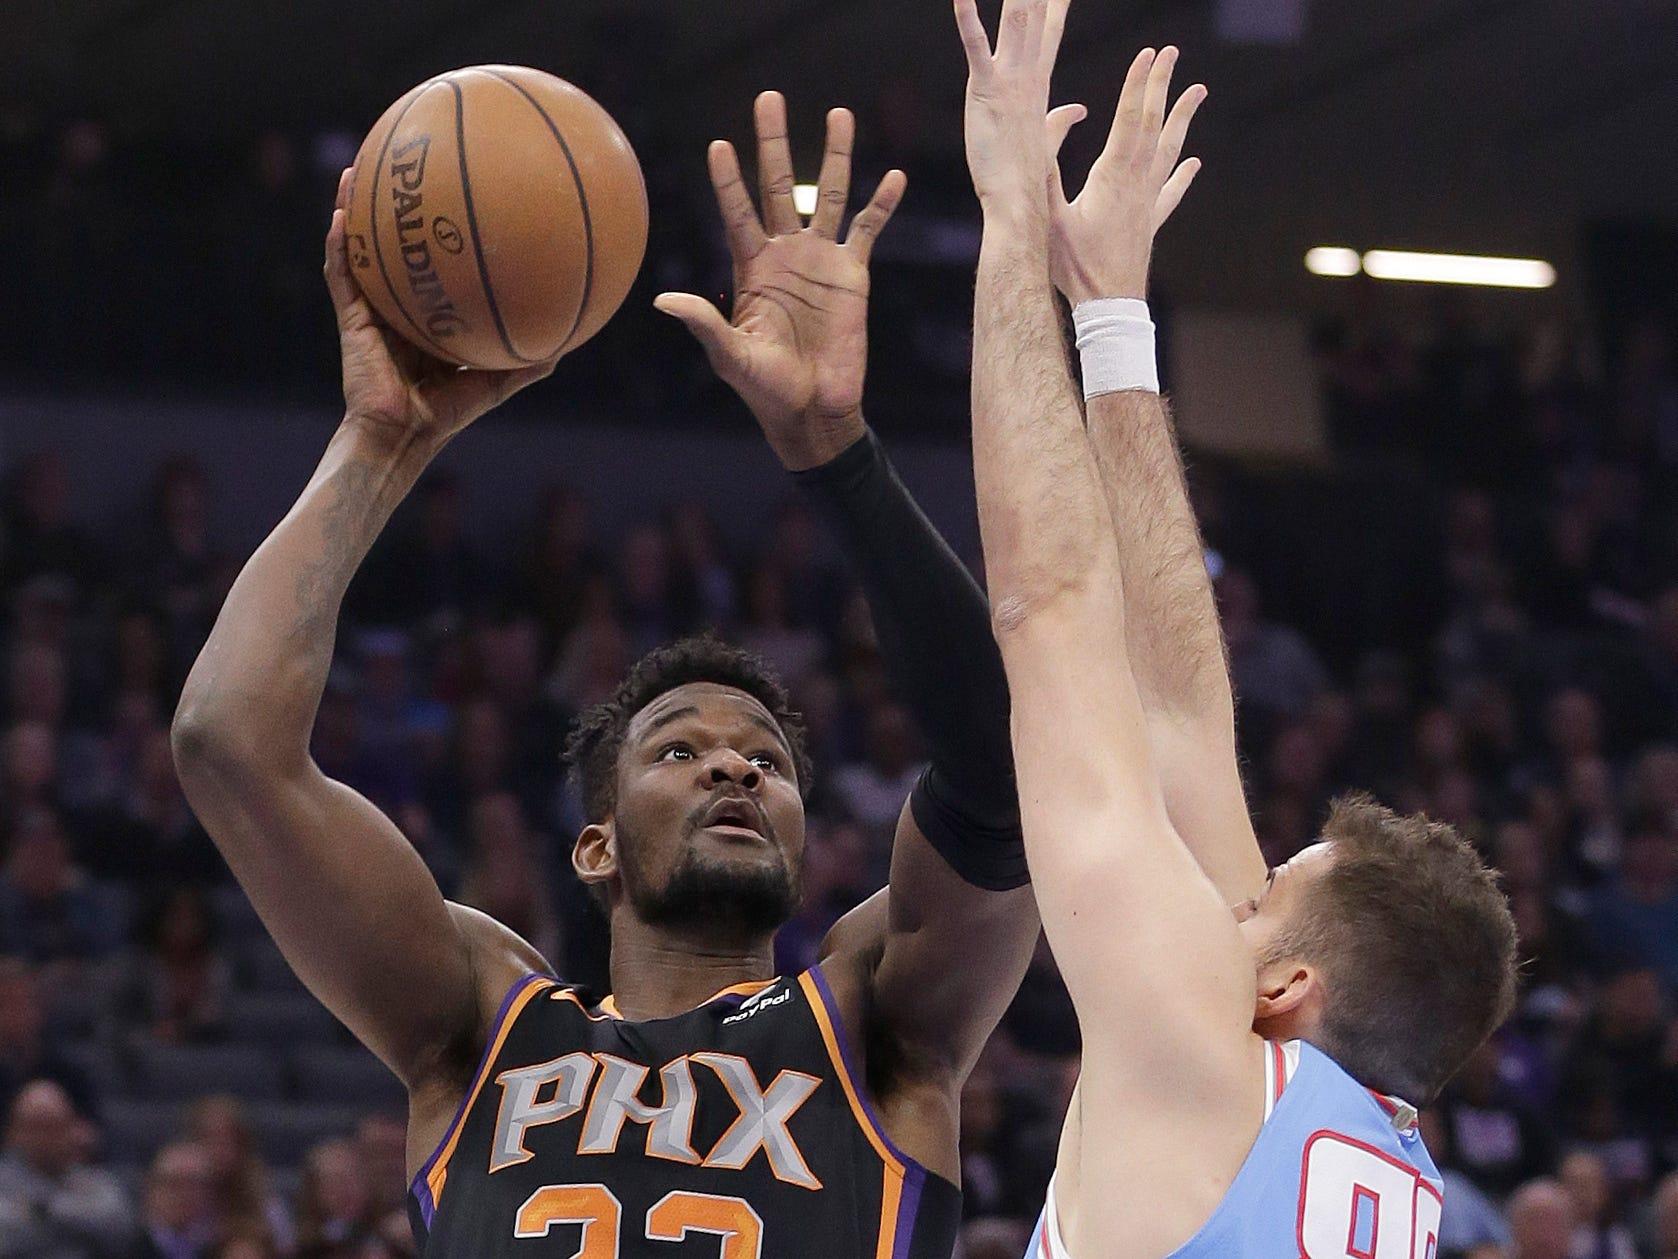 Phoenix Suns center Deandre Ayton, left, shoots over Sacramento Kings guard Bogdan Bogdanovic during the first quarter of an NBA basketball game Sunday, Feb. 10, 2019, in Sacramento, Calif.